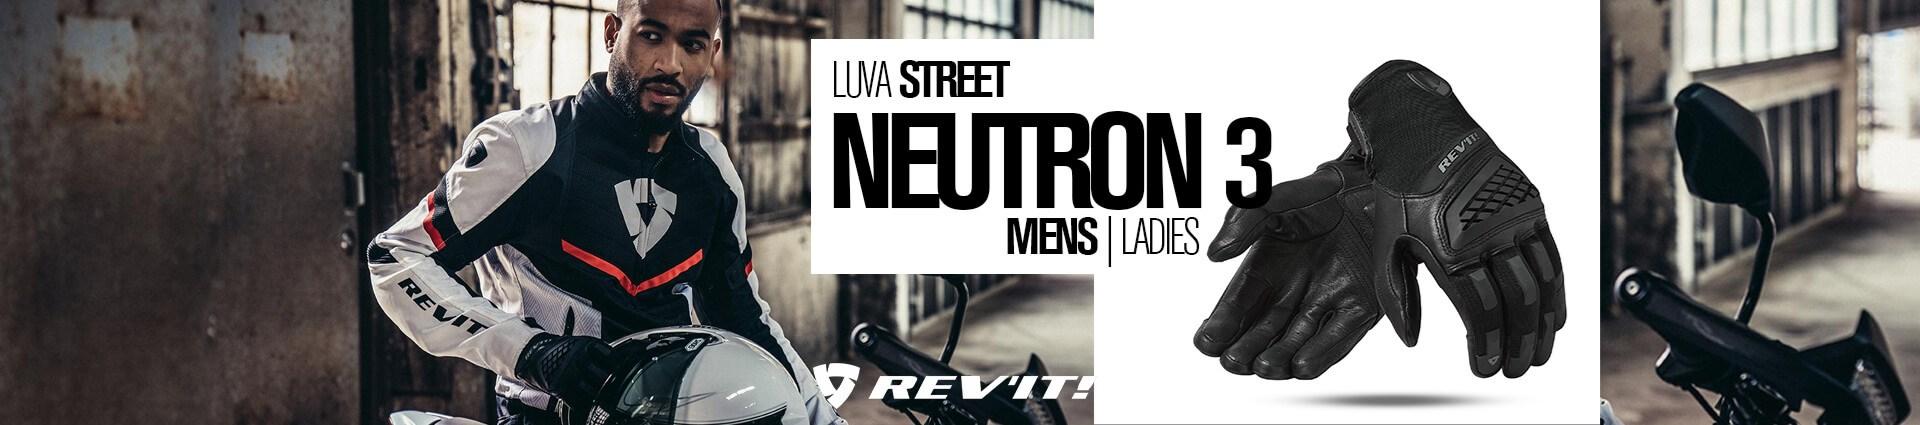 LP Luvas  - revit neutron 3